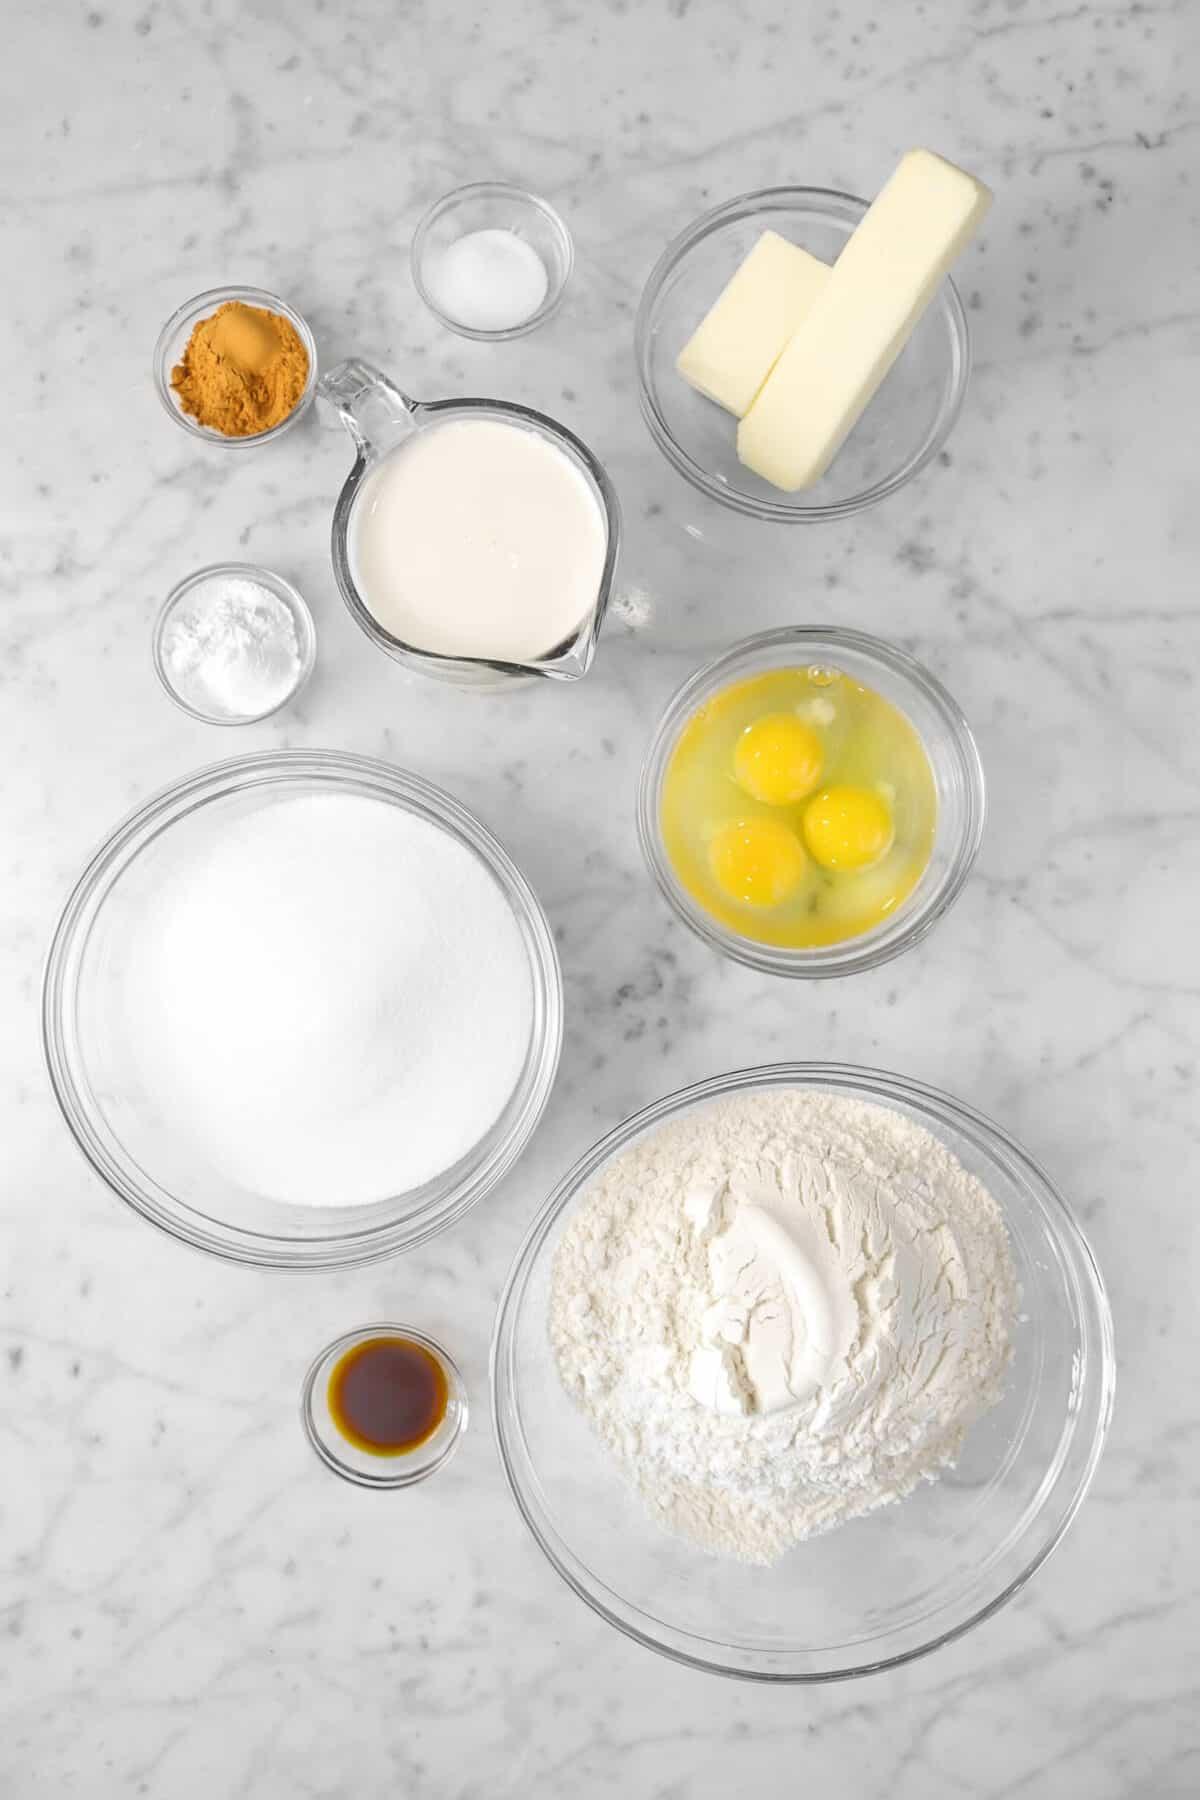 flour, eggs, sugar, vanilla, milk, baking powder, cinnamon, salt, and butter in glass bowls